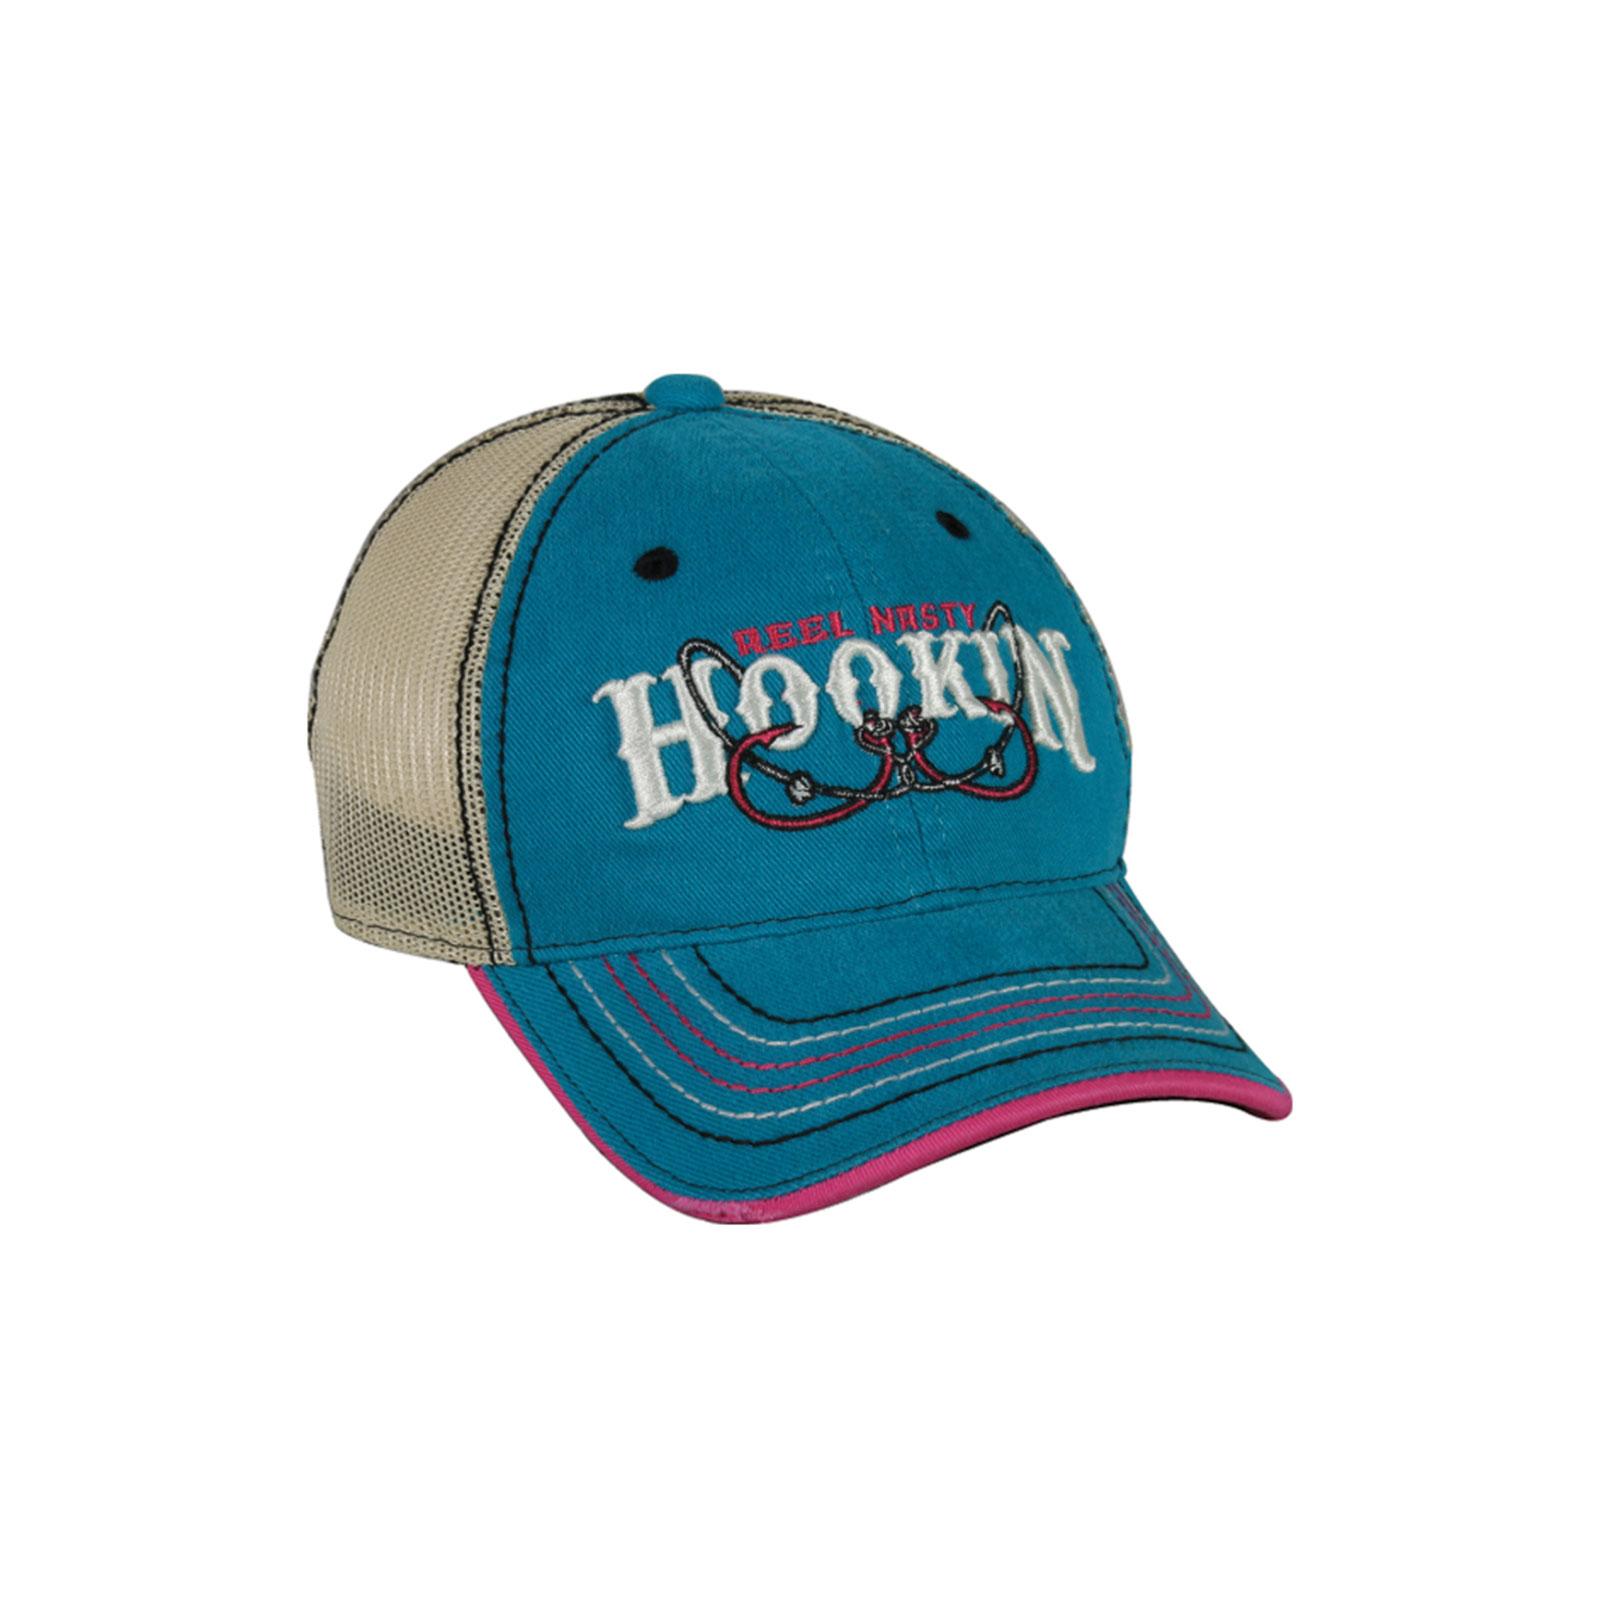 Outdoor cap womens reel nasty hookin fishing baseball for Womens fishing hat